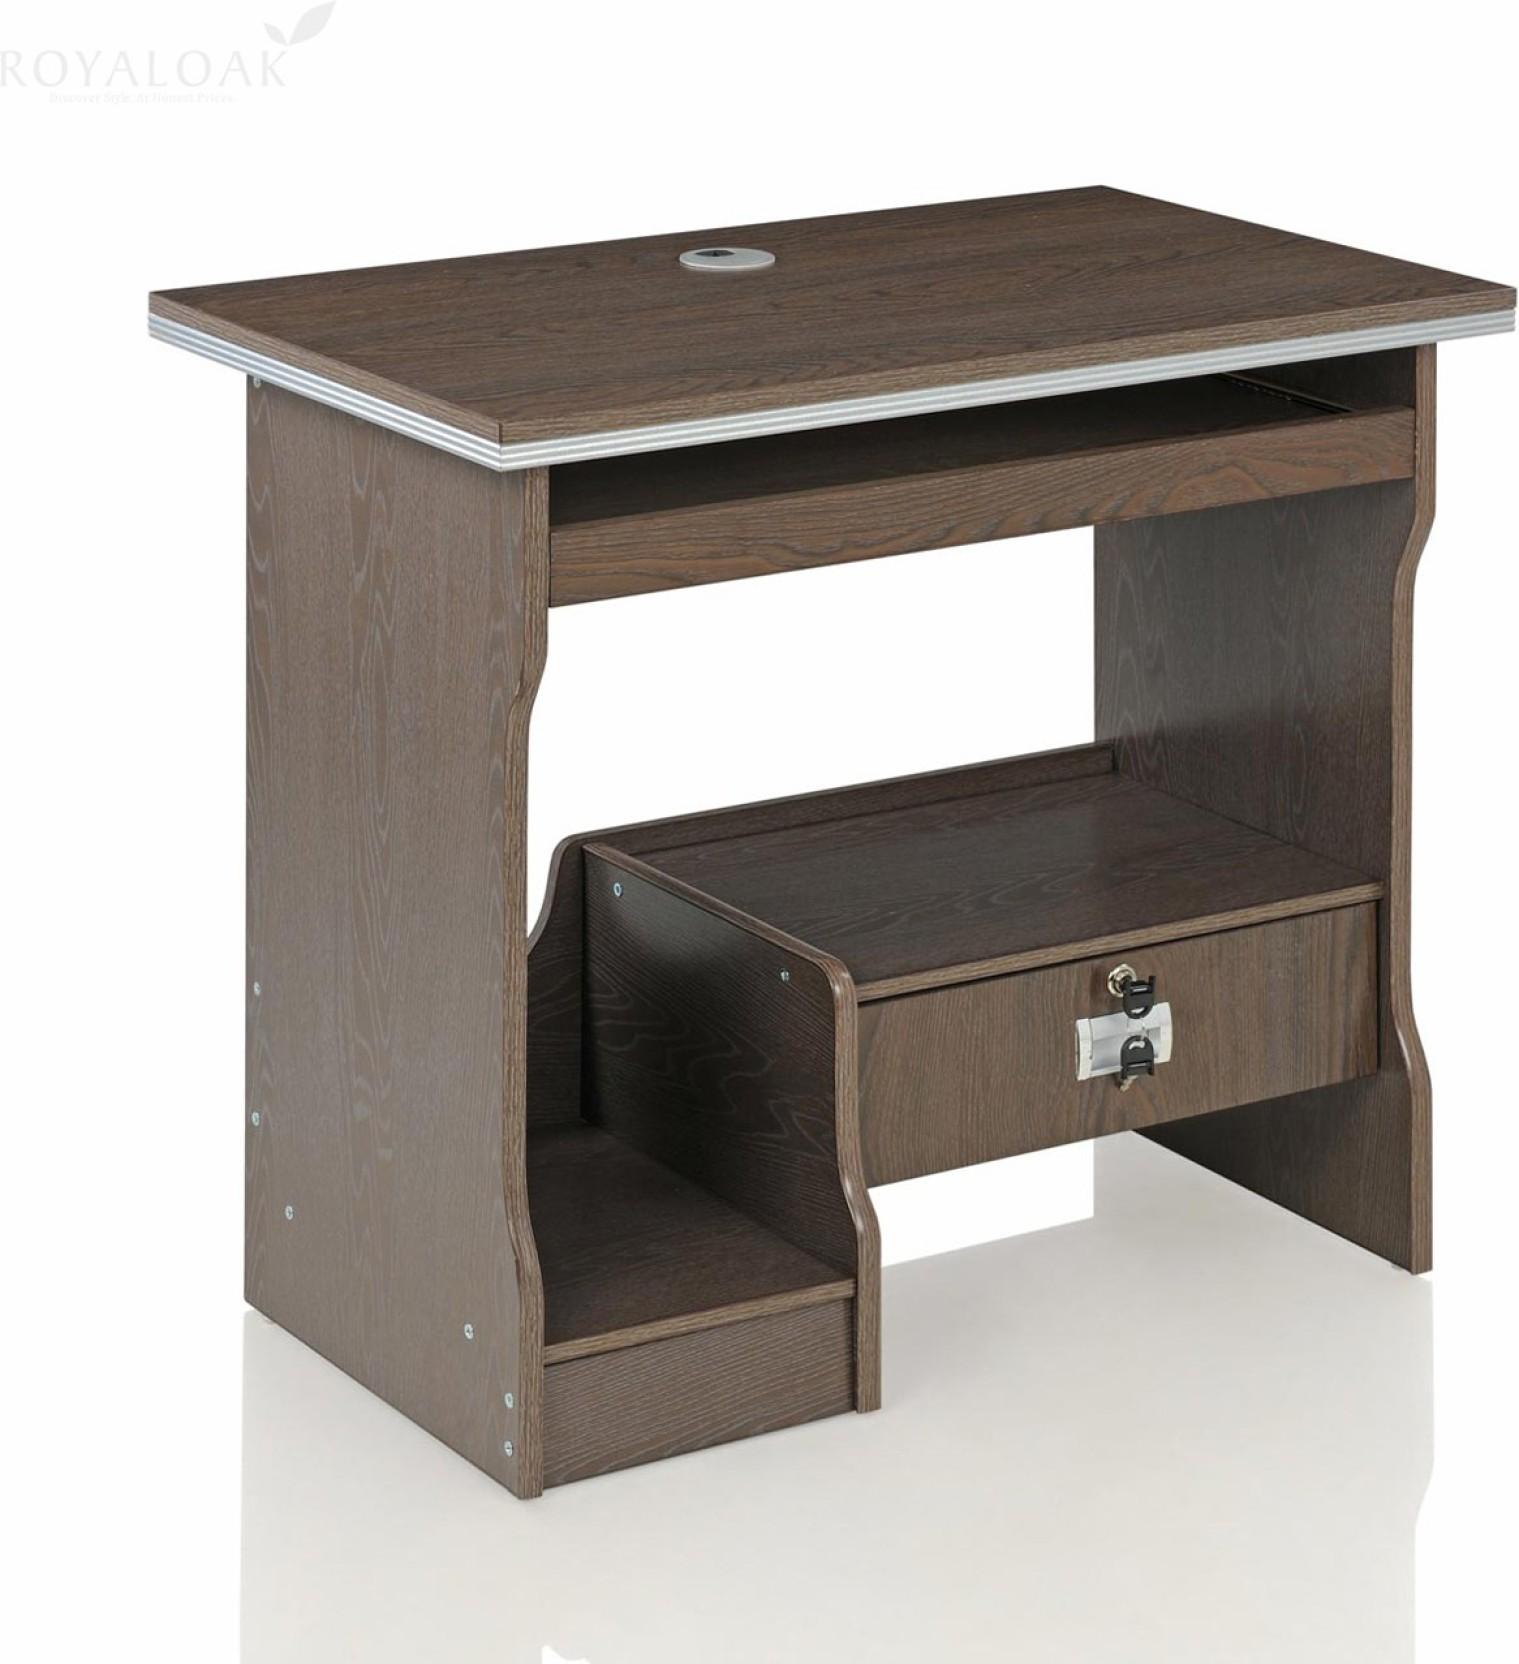 RoyalOak Acacia Engineered Wood Computer Desk. ON OFFER